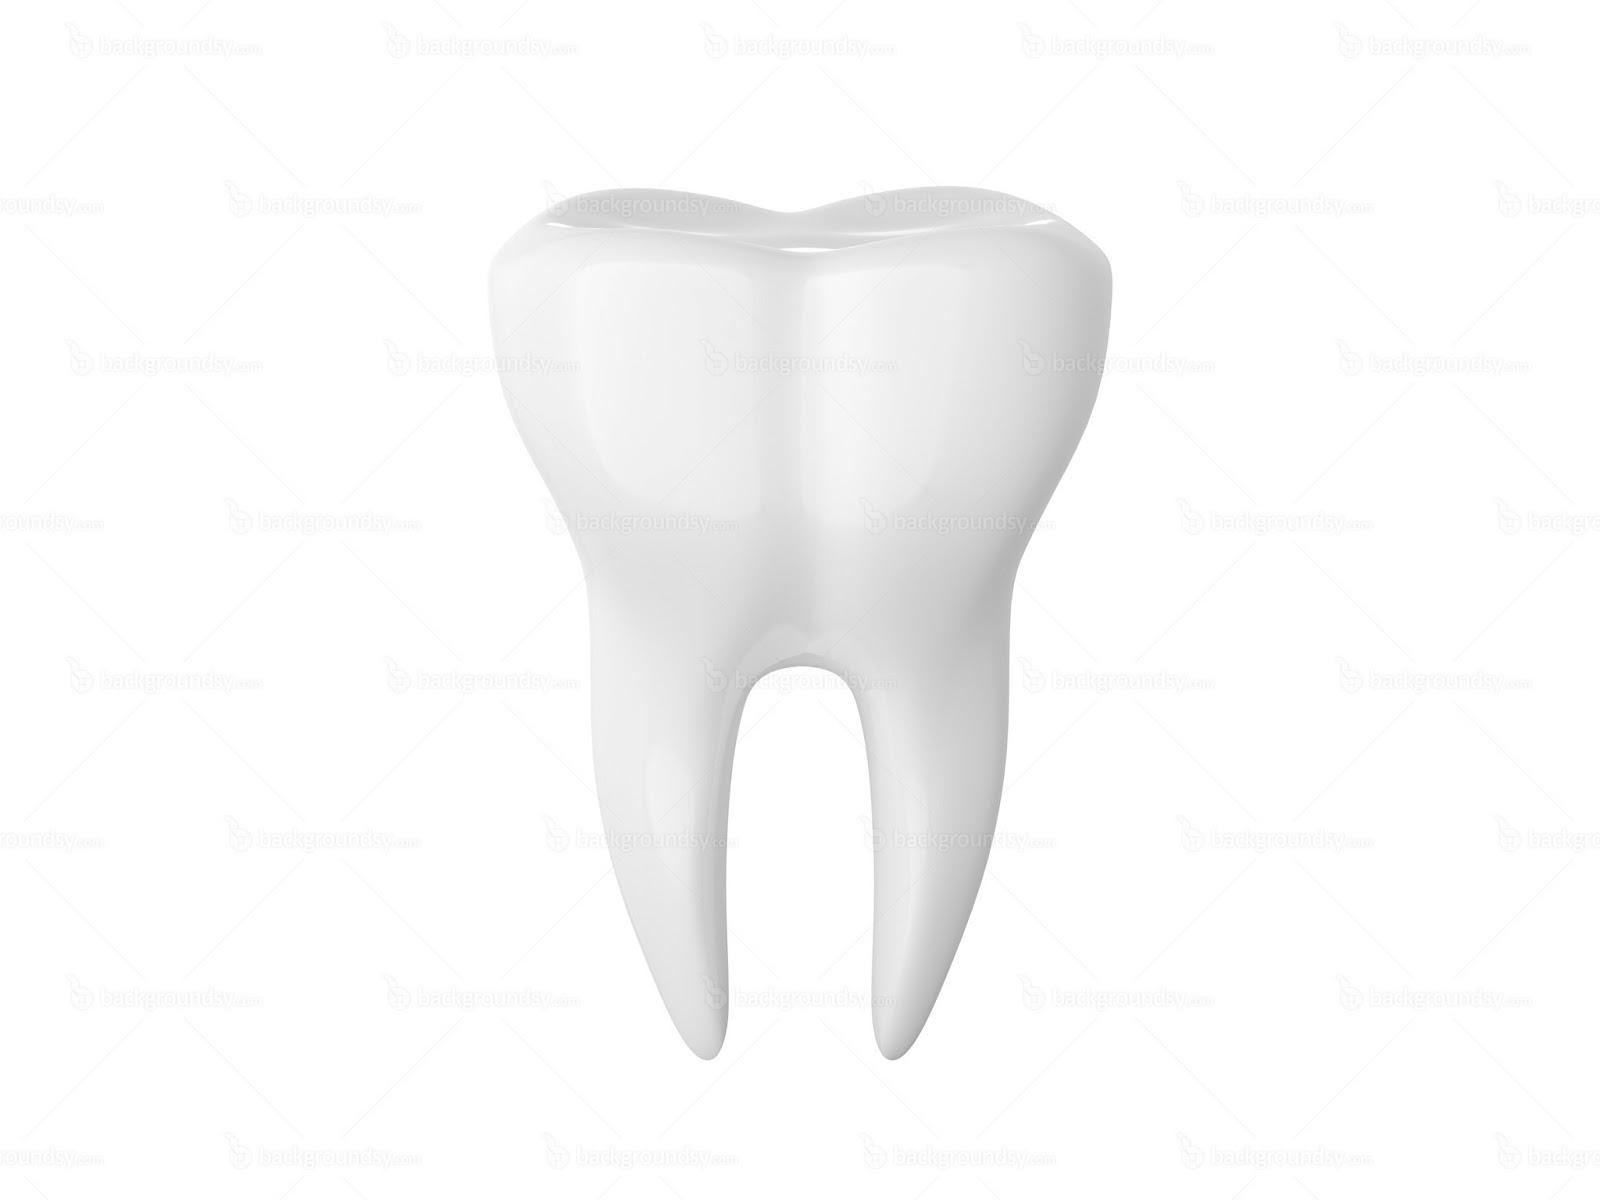 Tips Cara Mencegah Gigi Berlubang, cara agar gigi tidak berlubang, cara membuat gigi sehat tidak berlubang